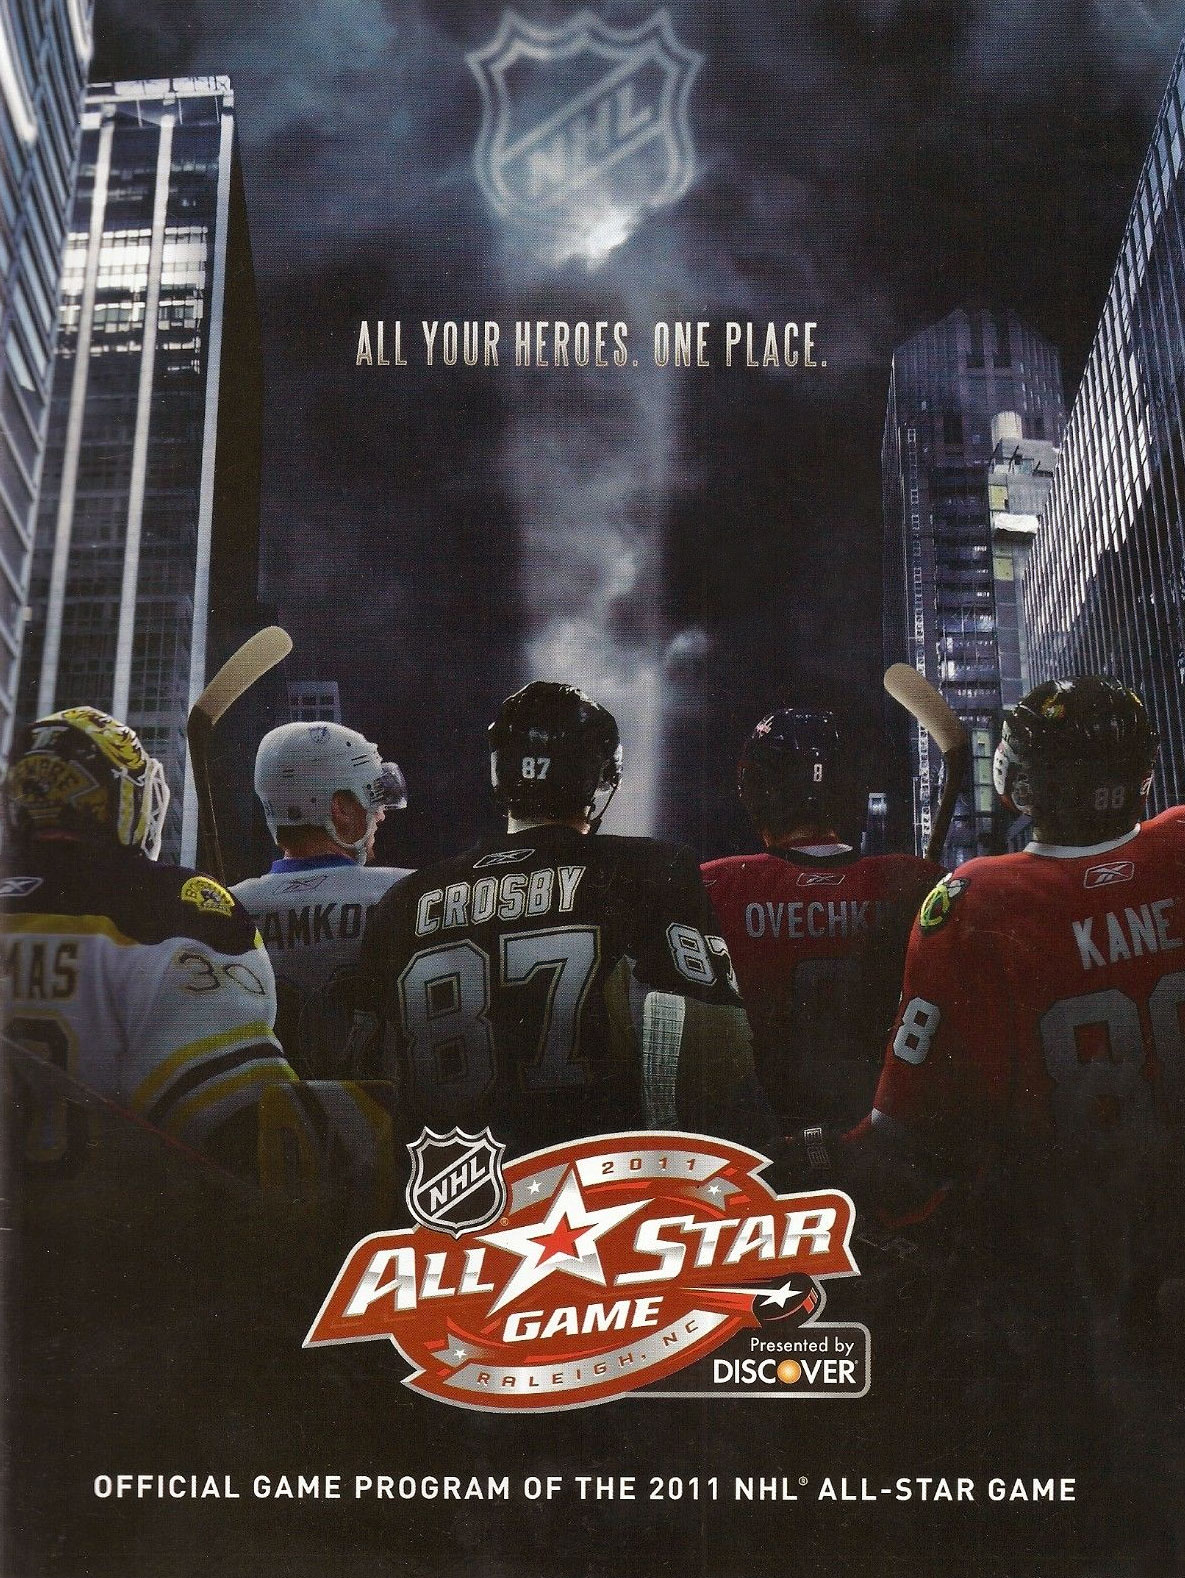 NHL All-Star Game Program Program (2010/11) - 2011 NHL All-Star Game program cover - game held in Raleigh, NC SportsLogos.Net